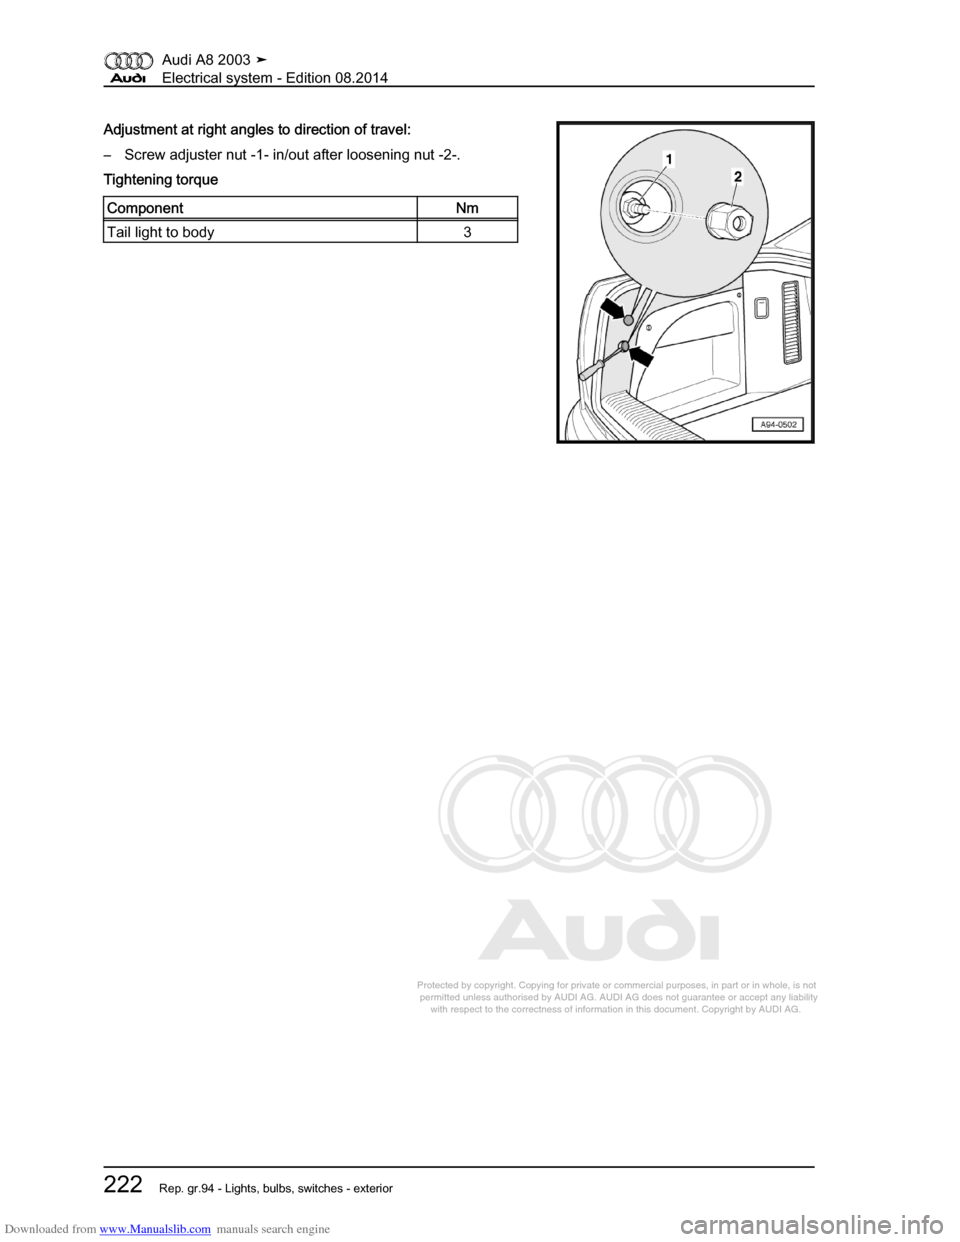 AUDI A8 2003 D3 / 2.G Electrical System Workshop Manual